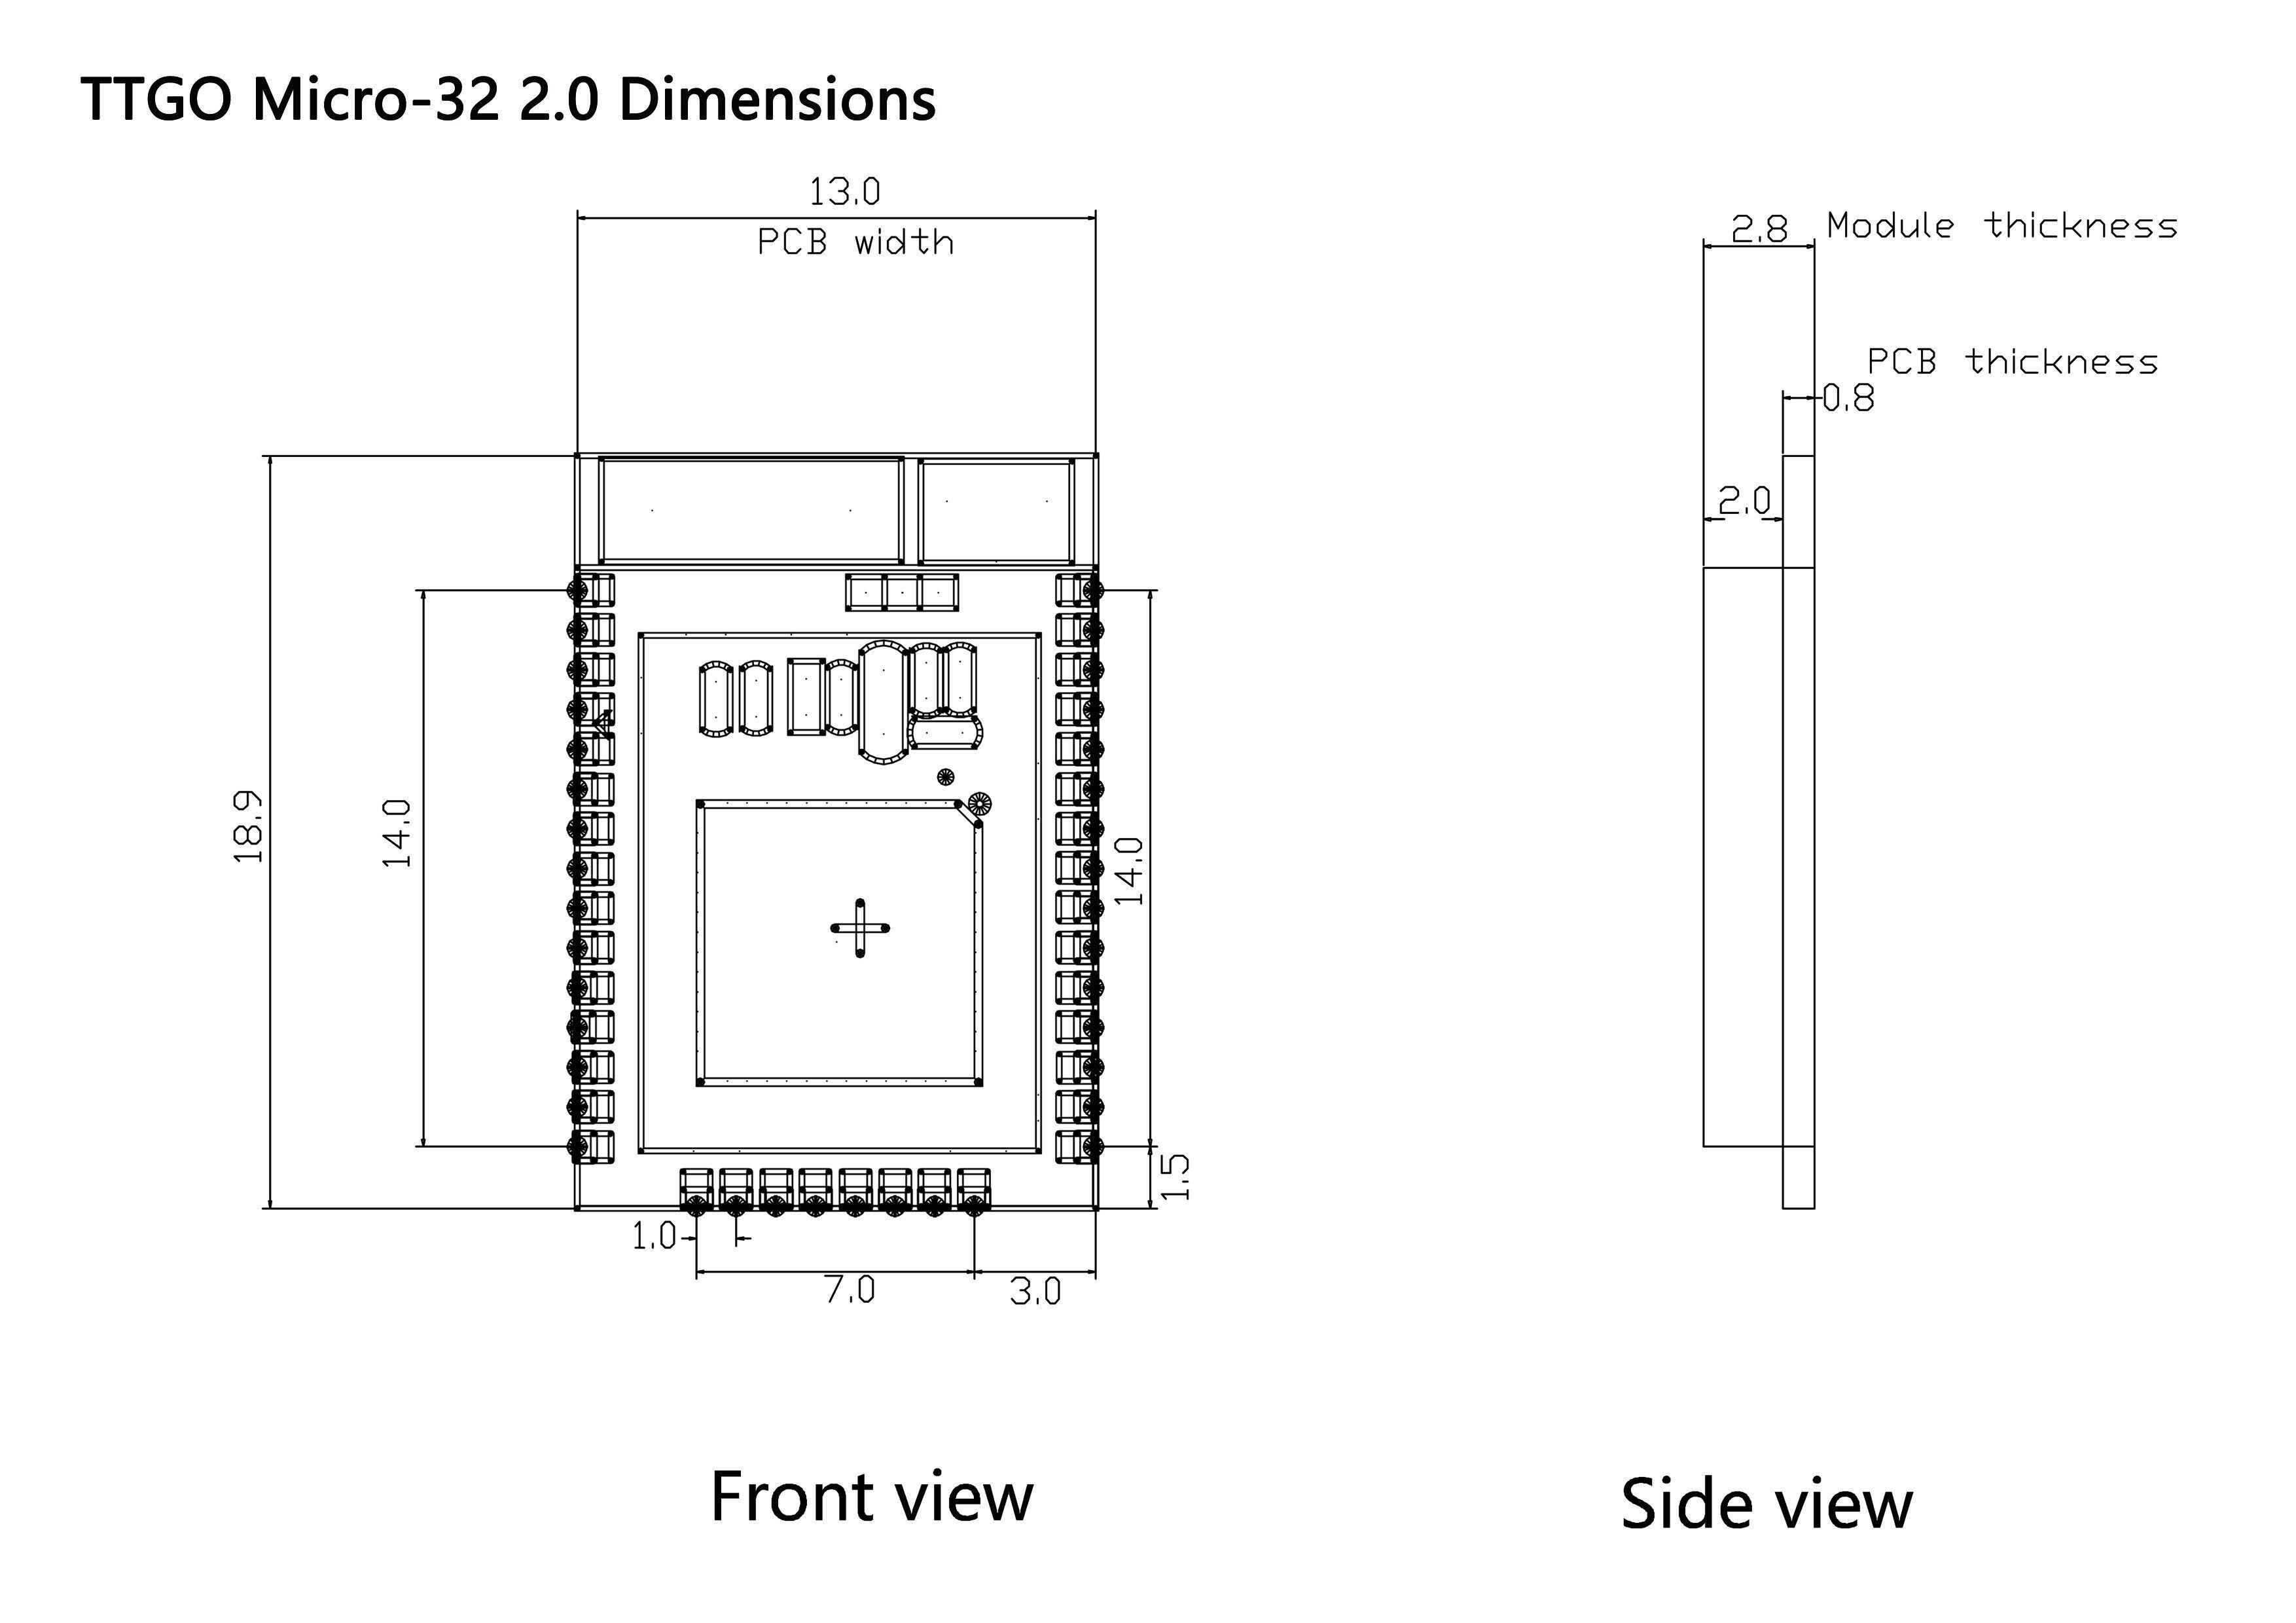 PDF to show solder pads · Issue #1 · LilyGO/TTGO-micro32-V2 0 · GitHub